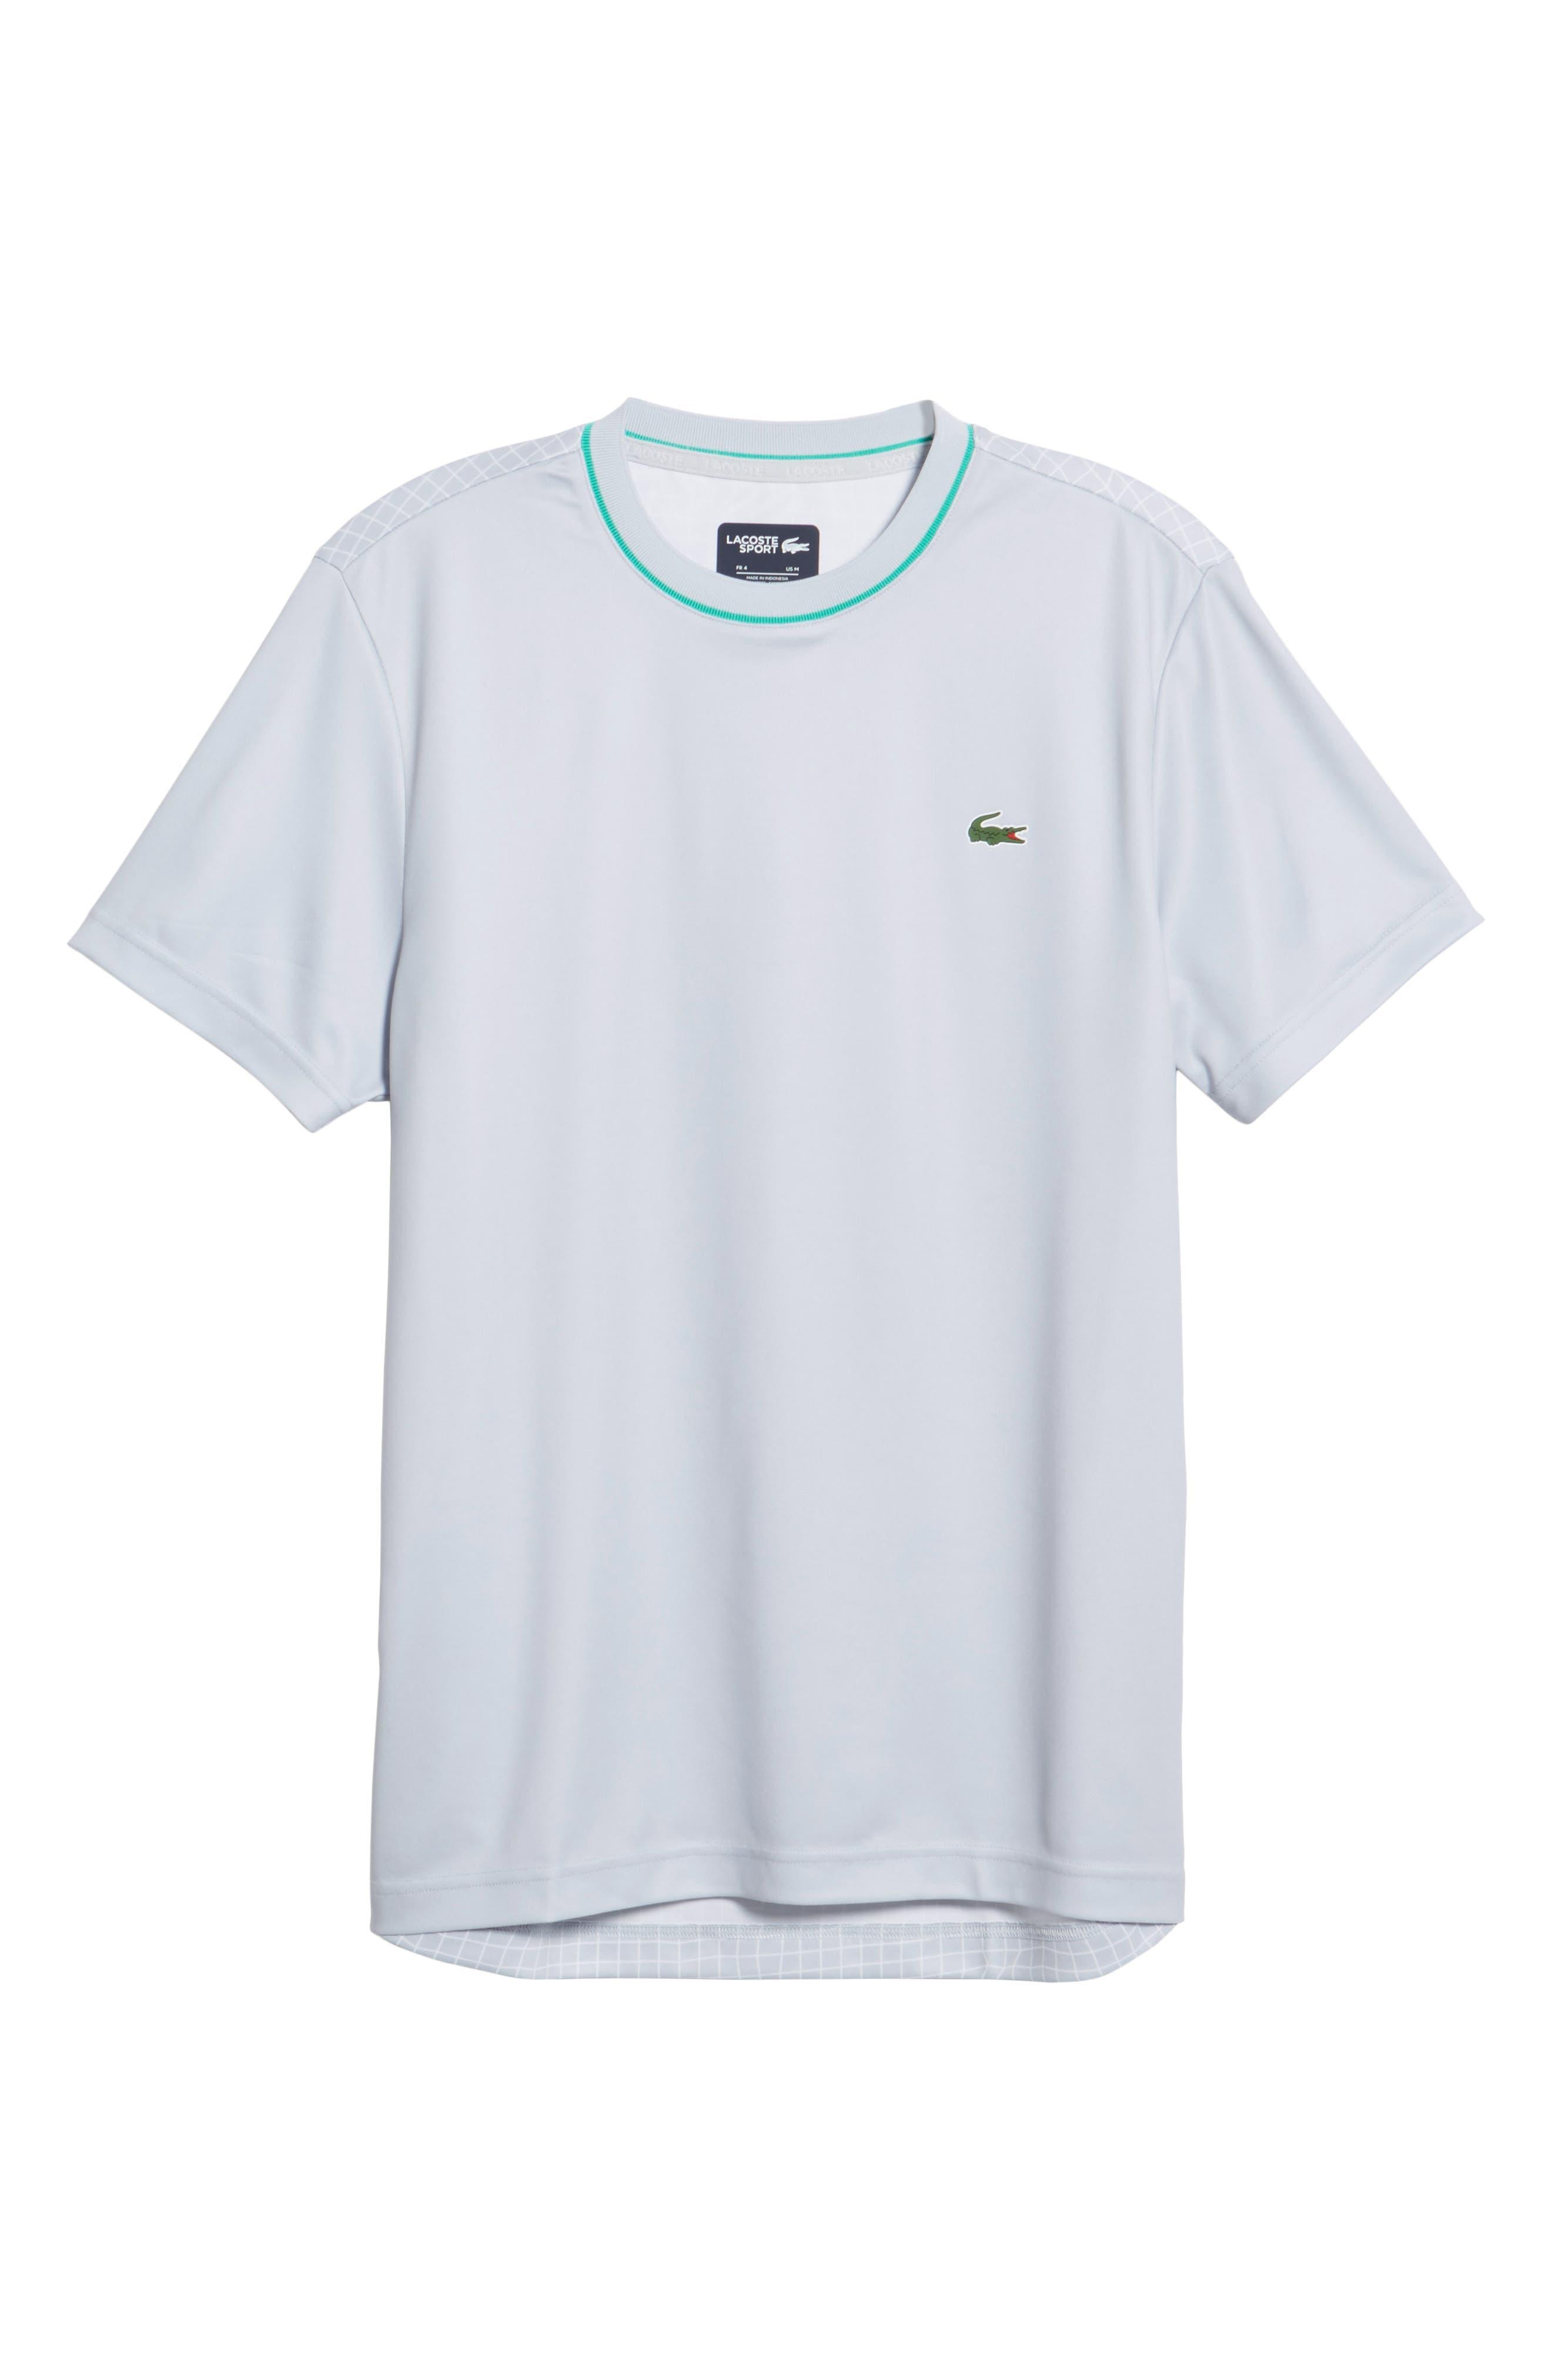 Regular Fit Ultra Dry T-Shirt,                             Alternate thumbnail 6, color,                             032